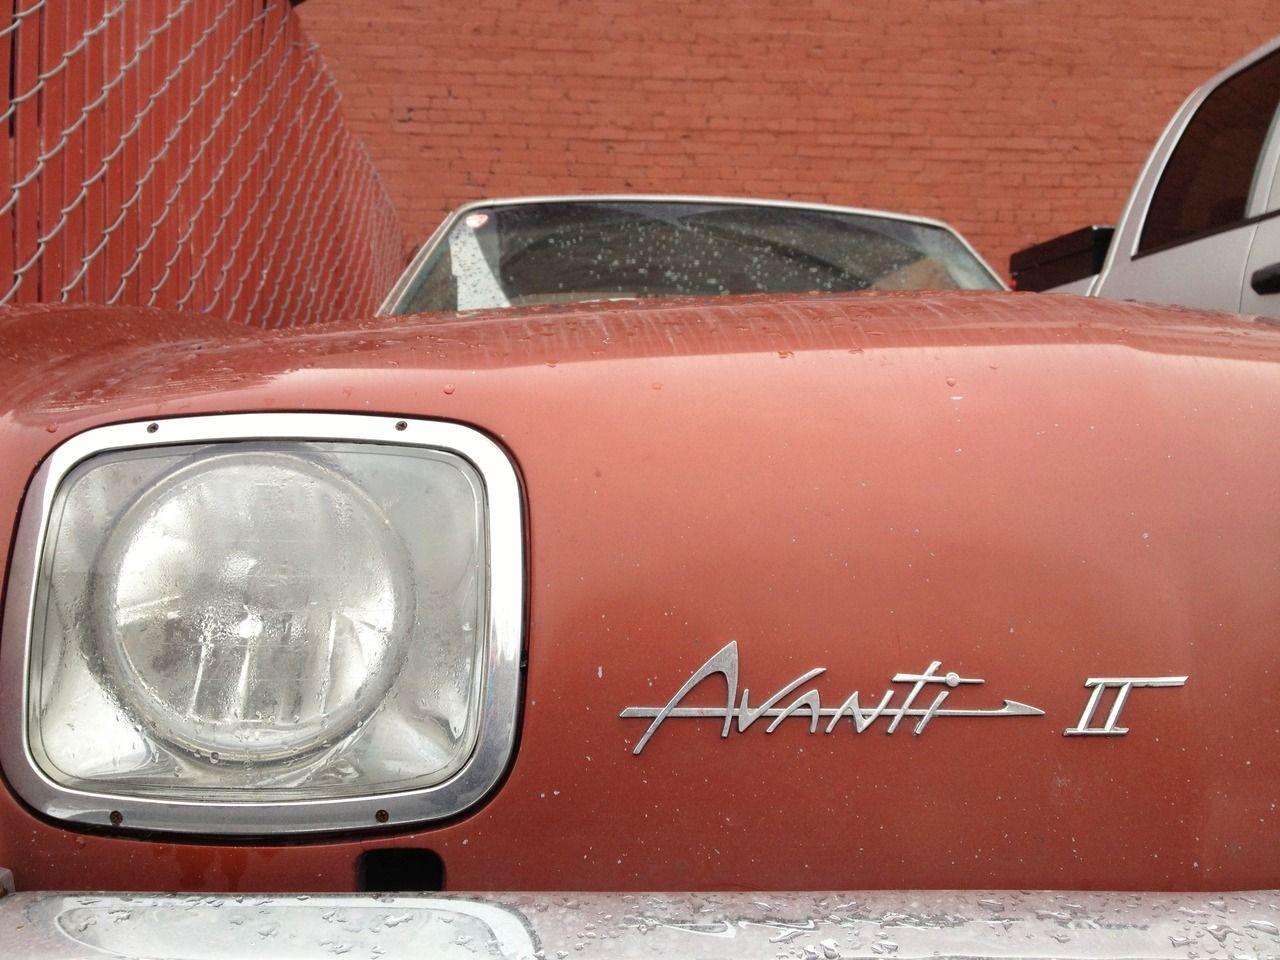 1965 Avanti II